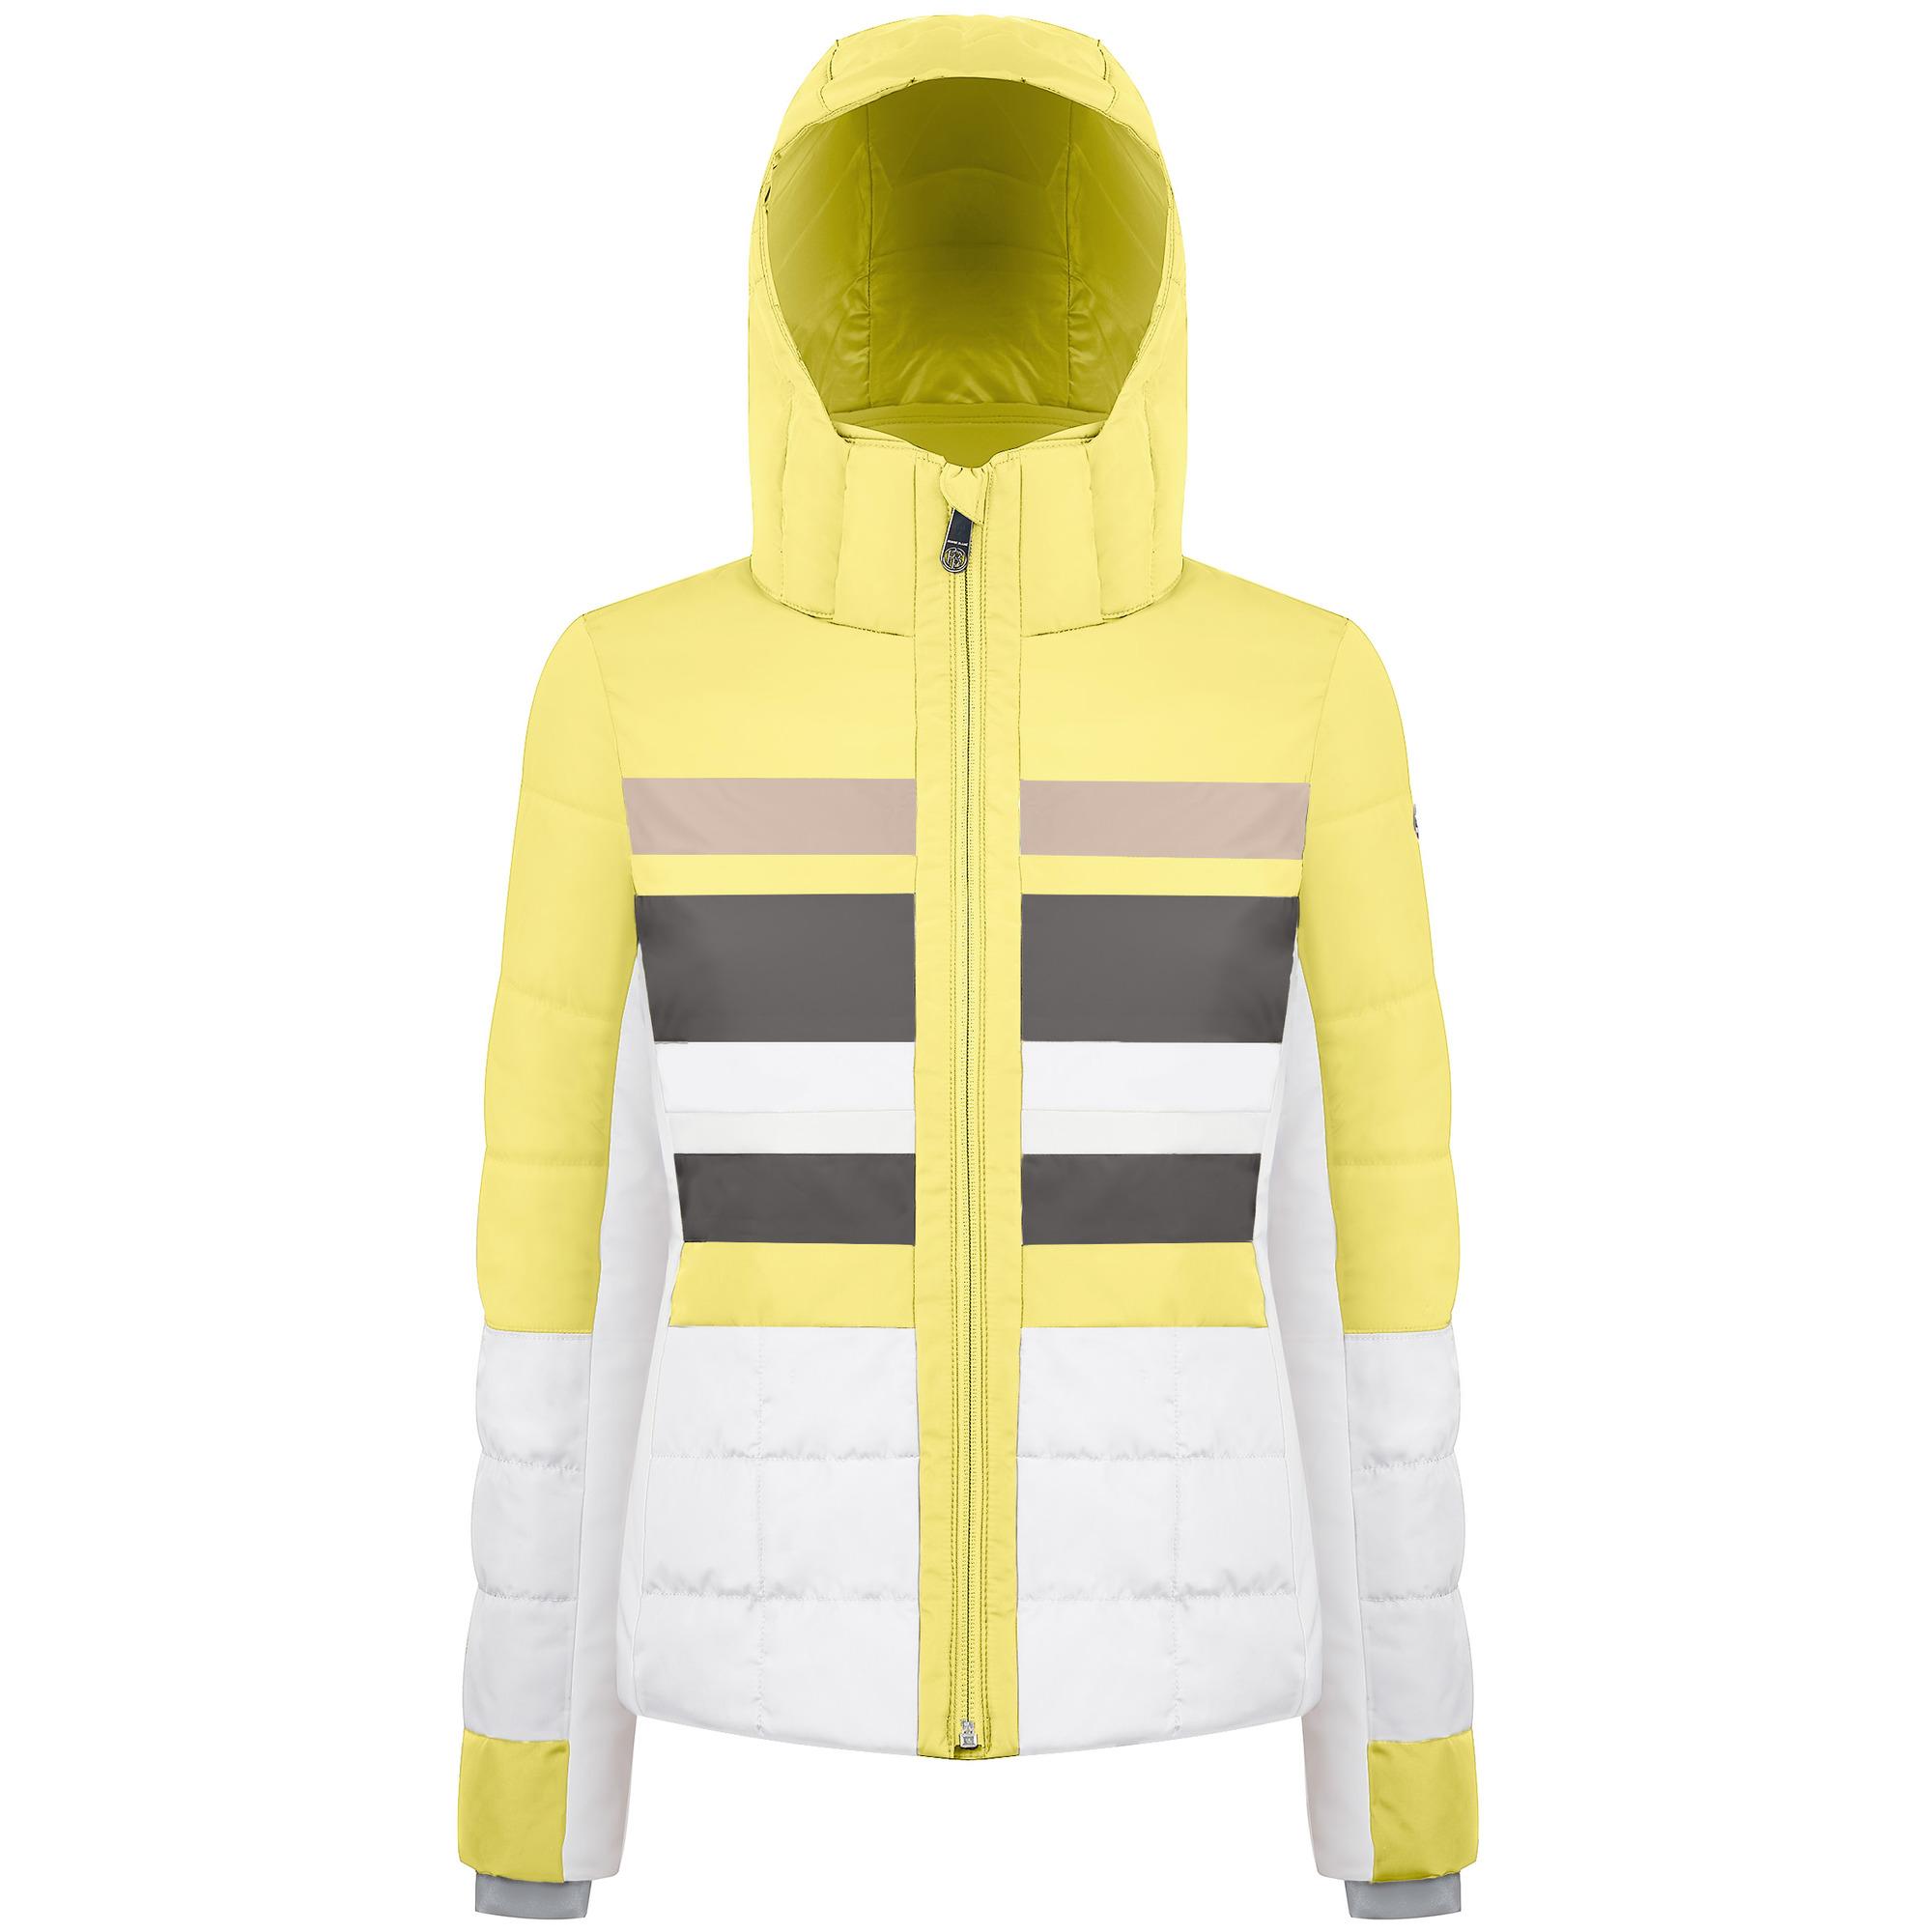 dc1de54ed7 Poivre Blanc női síkabát 1004, yellow - Tormasport